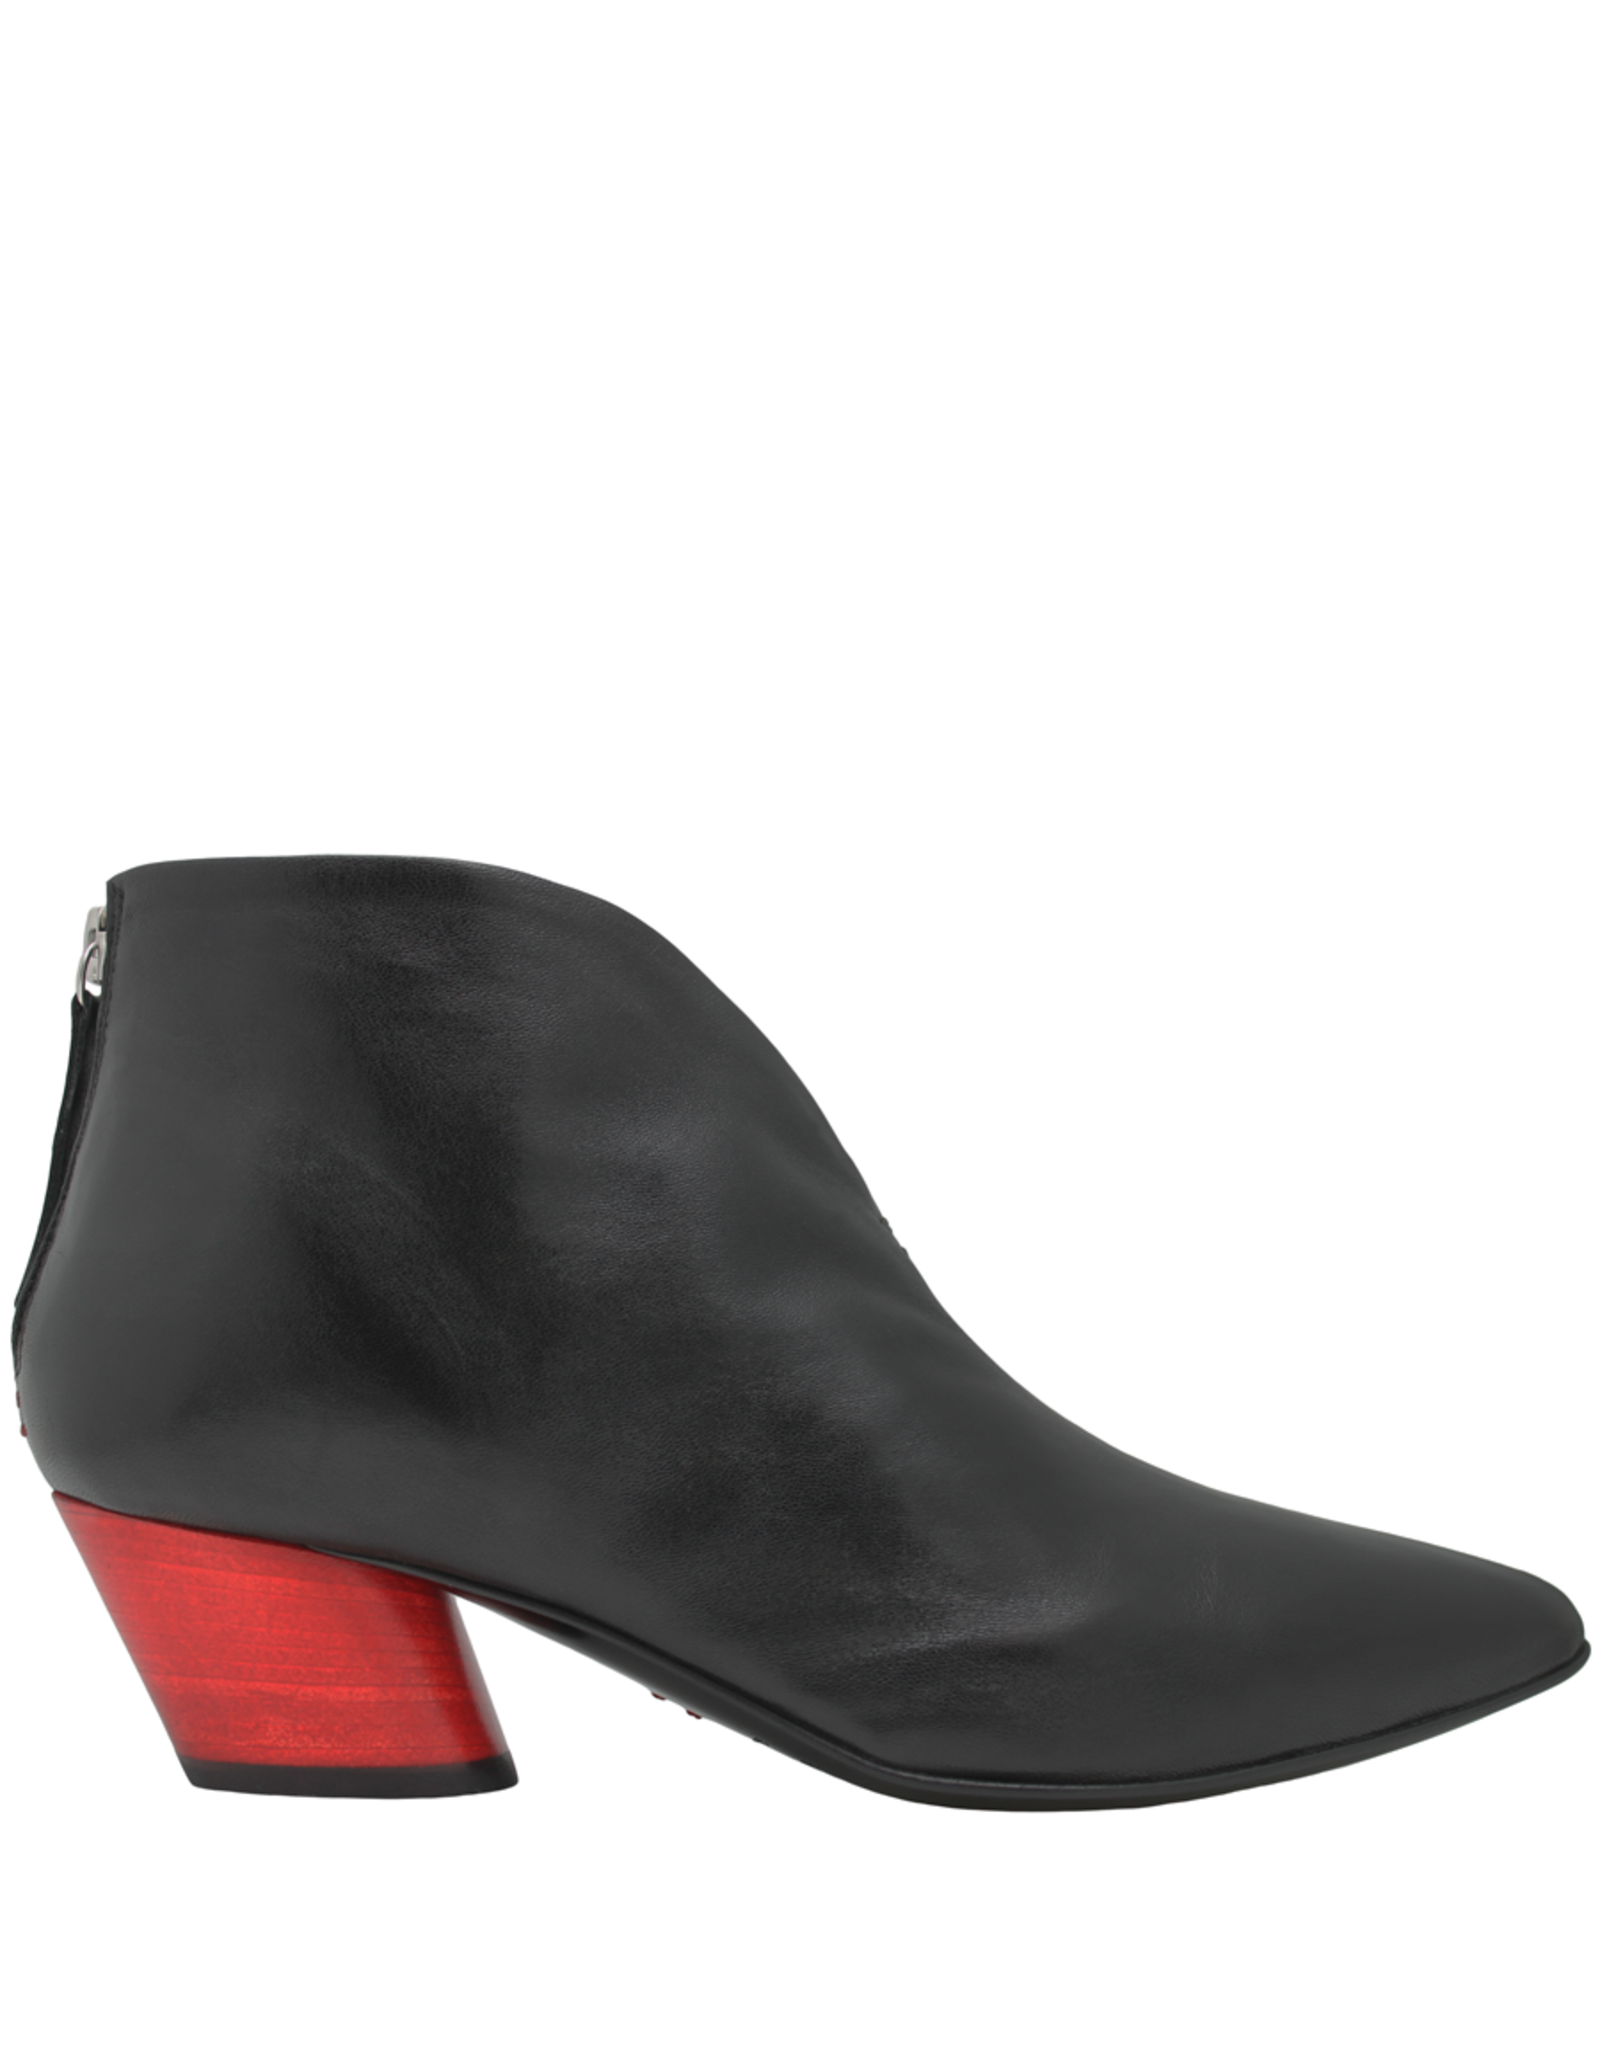 Halmanera Halmanera Black Point Toe Ankle Boot Red Heel 2014